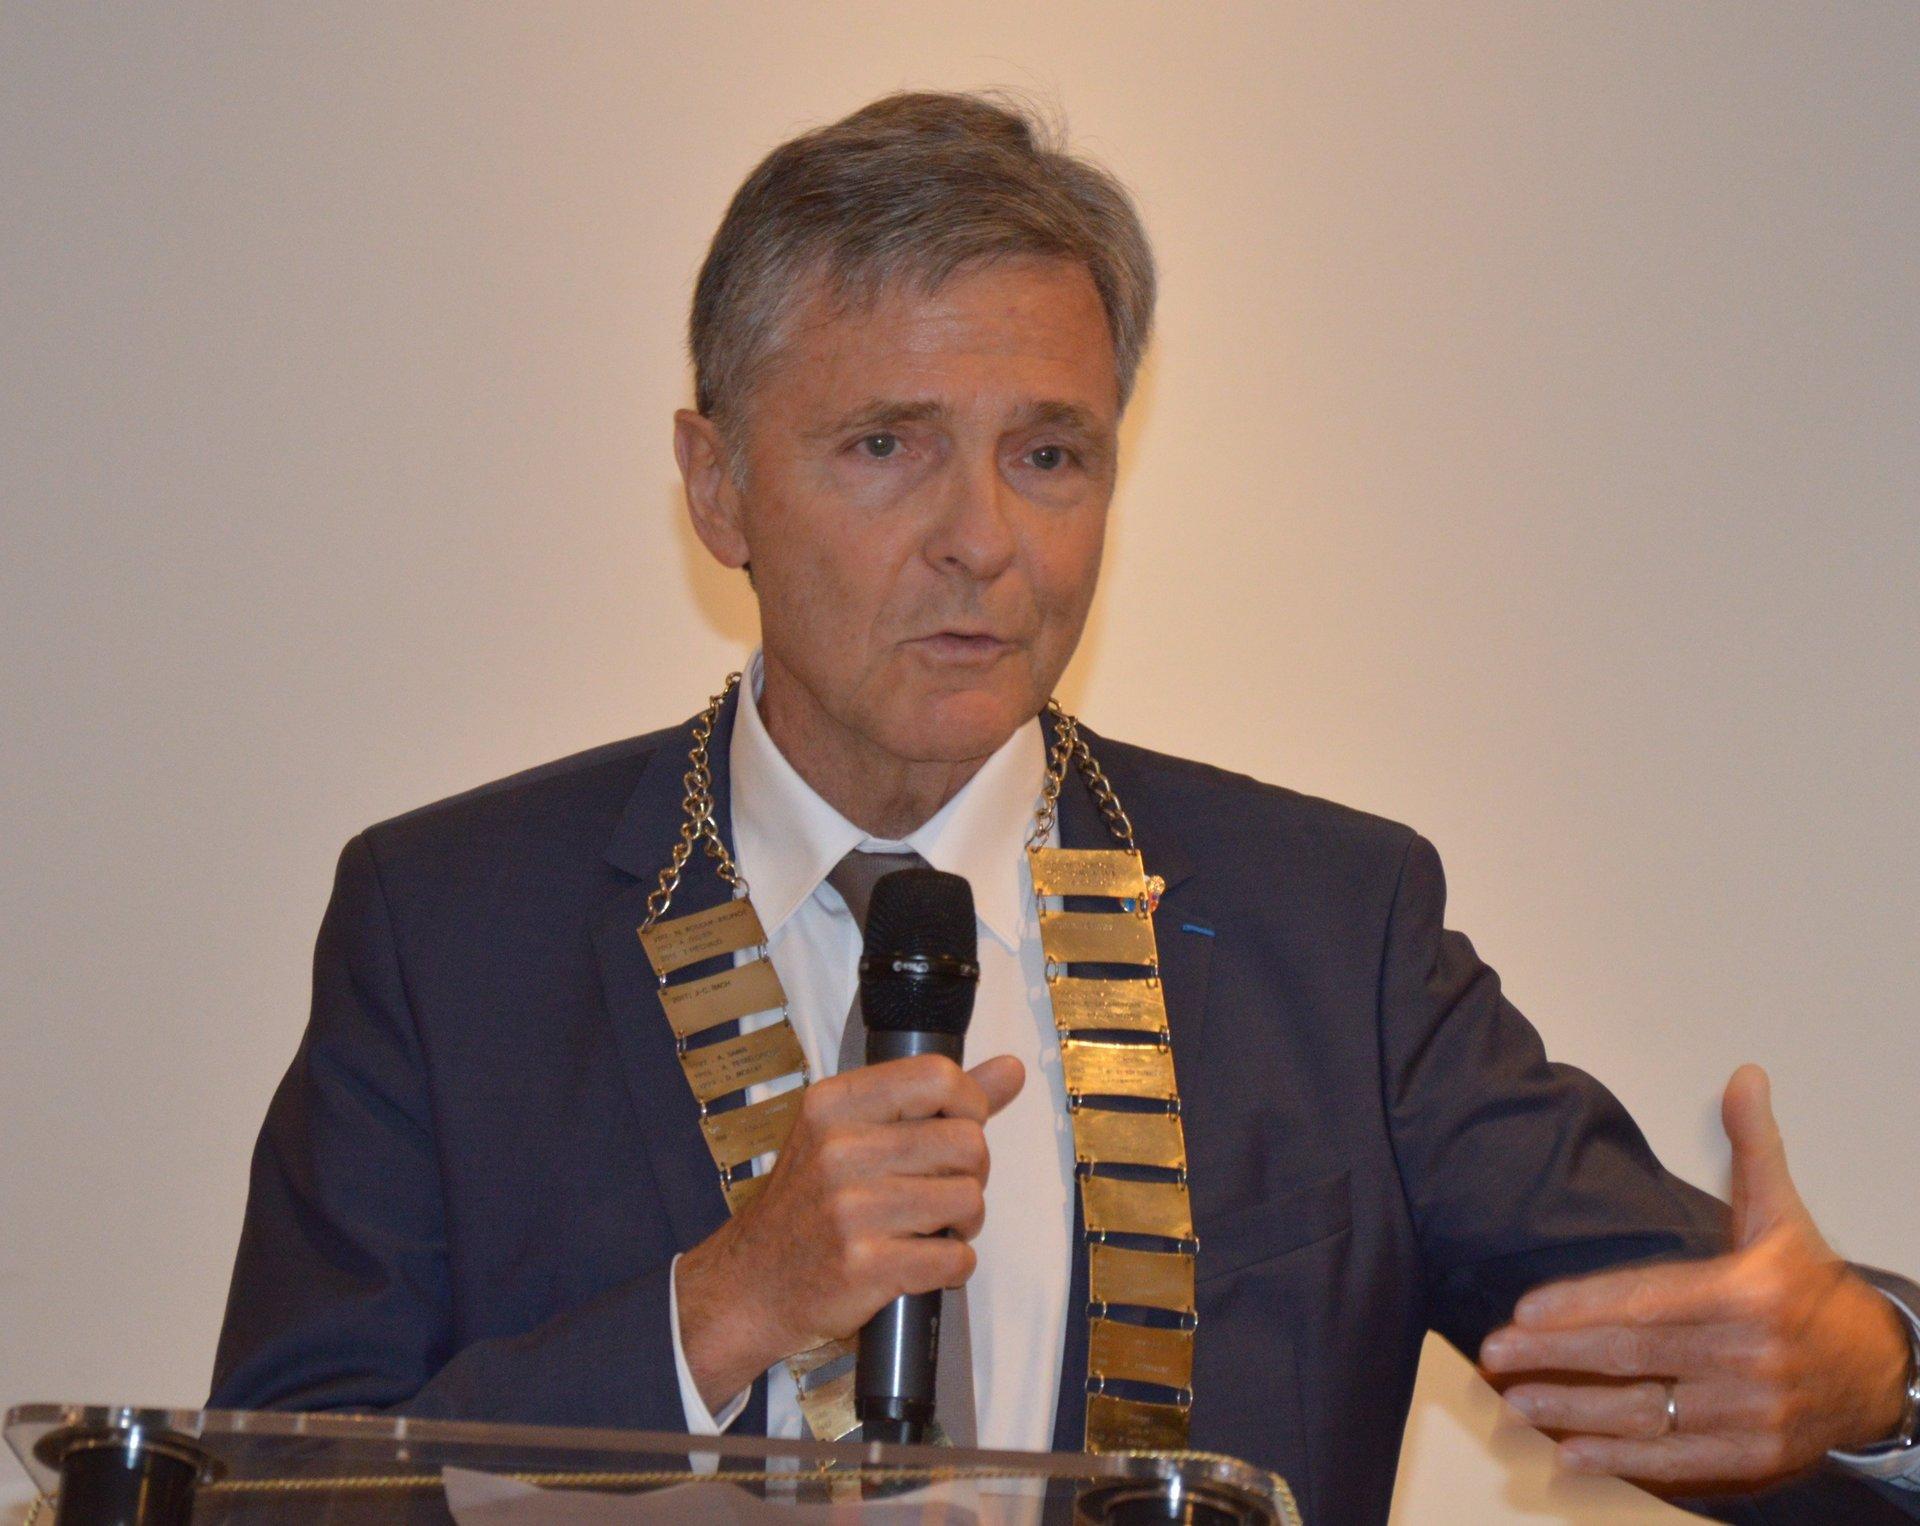 Rotary Club Bordeaux Jean-Claude Bach Président 2017 / 2018